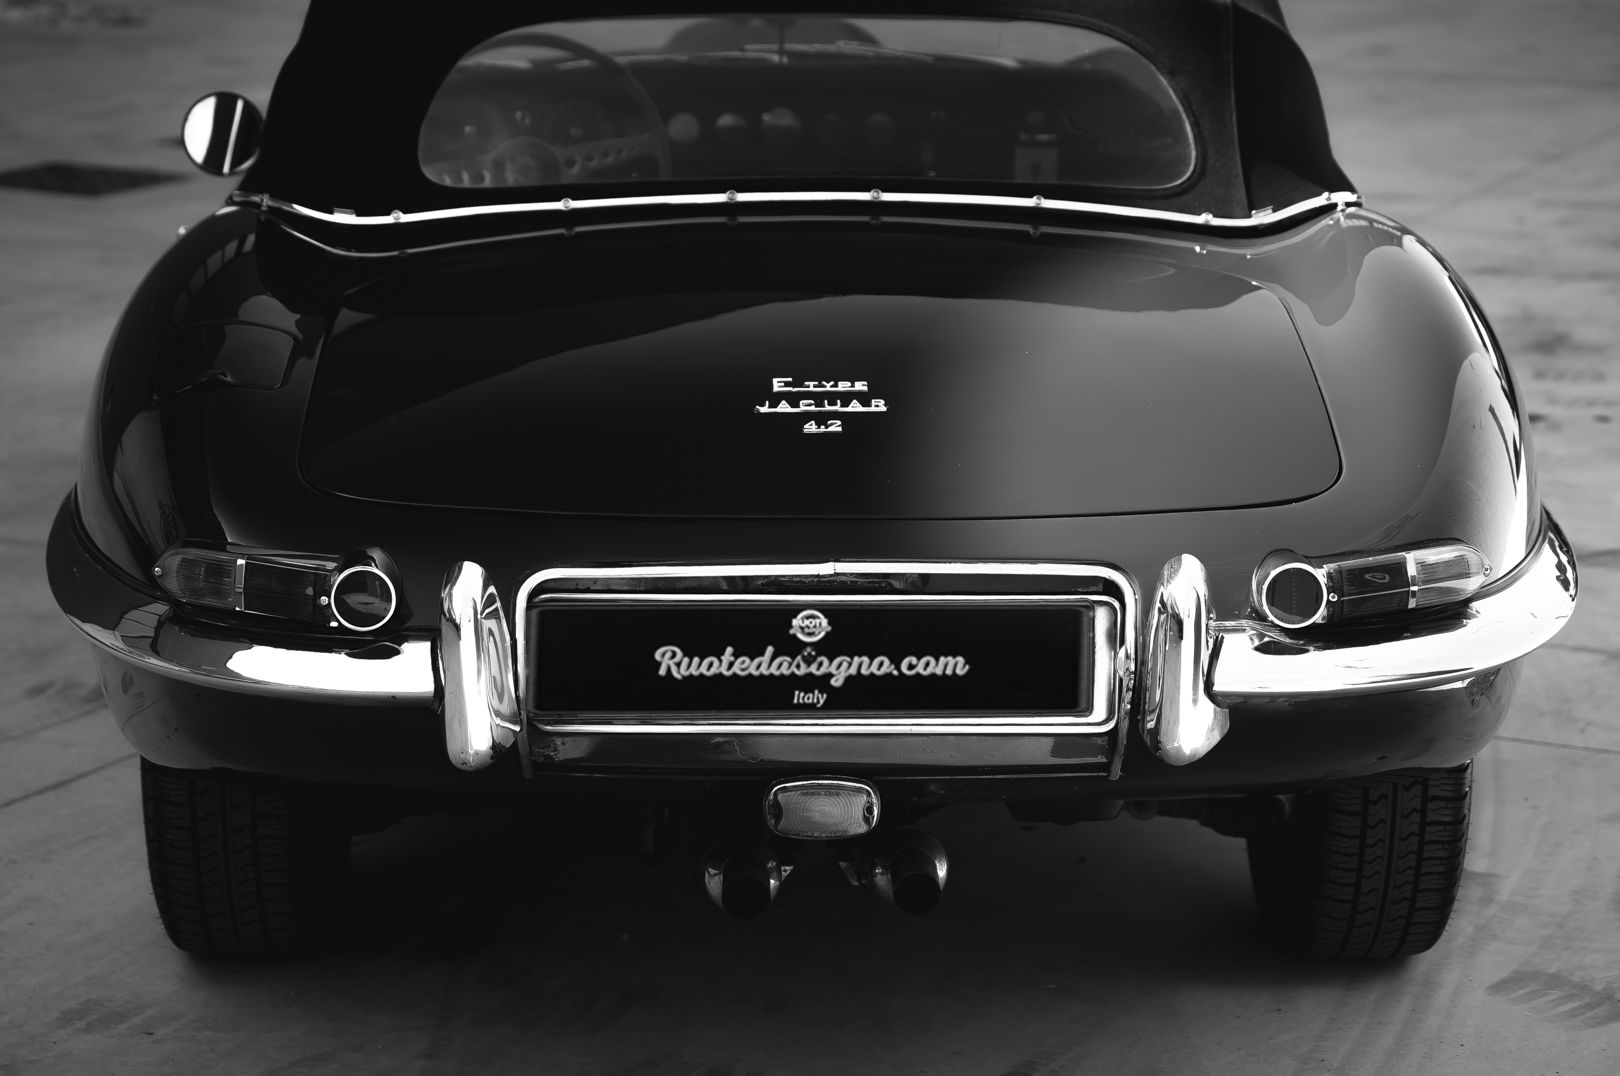 1968 Jaguar E-Type 4.2 Series 1 OTS 75640